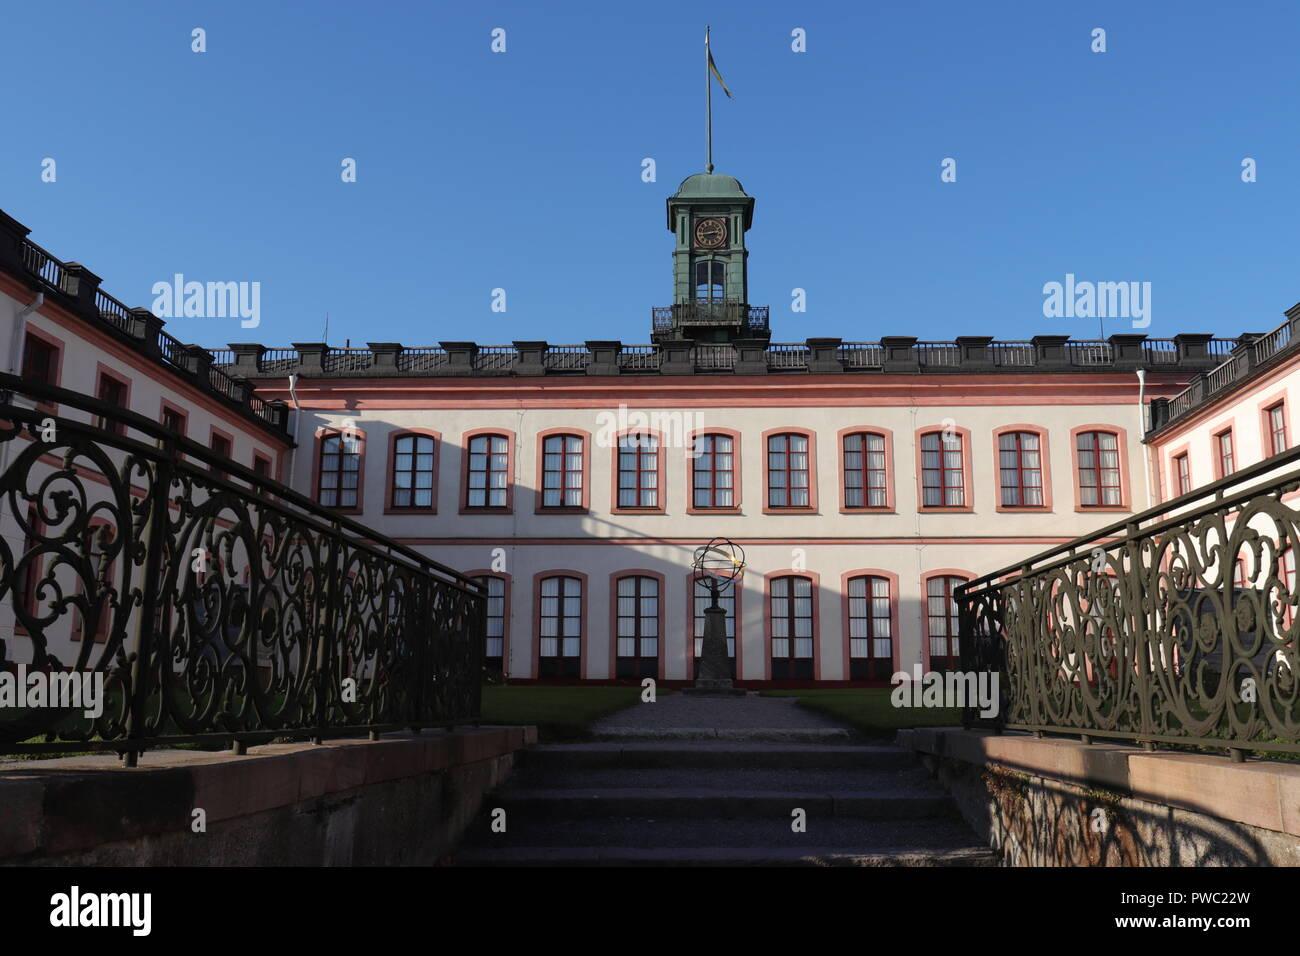 Château Royal de Tullgarn dans Tullgarn, Suède Banque D'Images